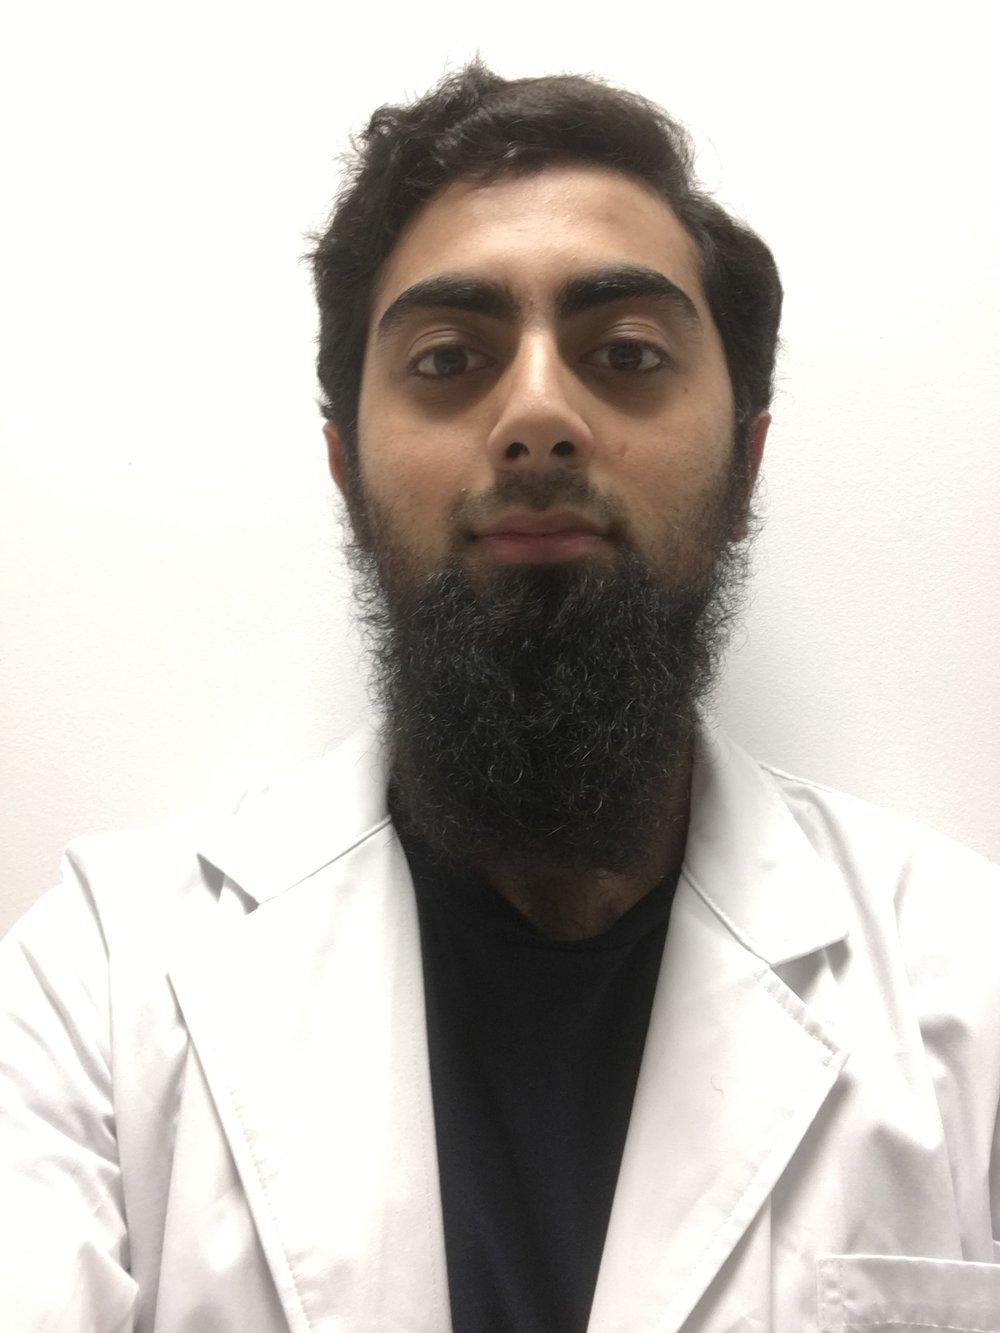 Mohammed Tayyib Khan